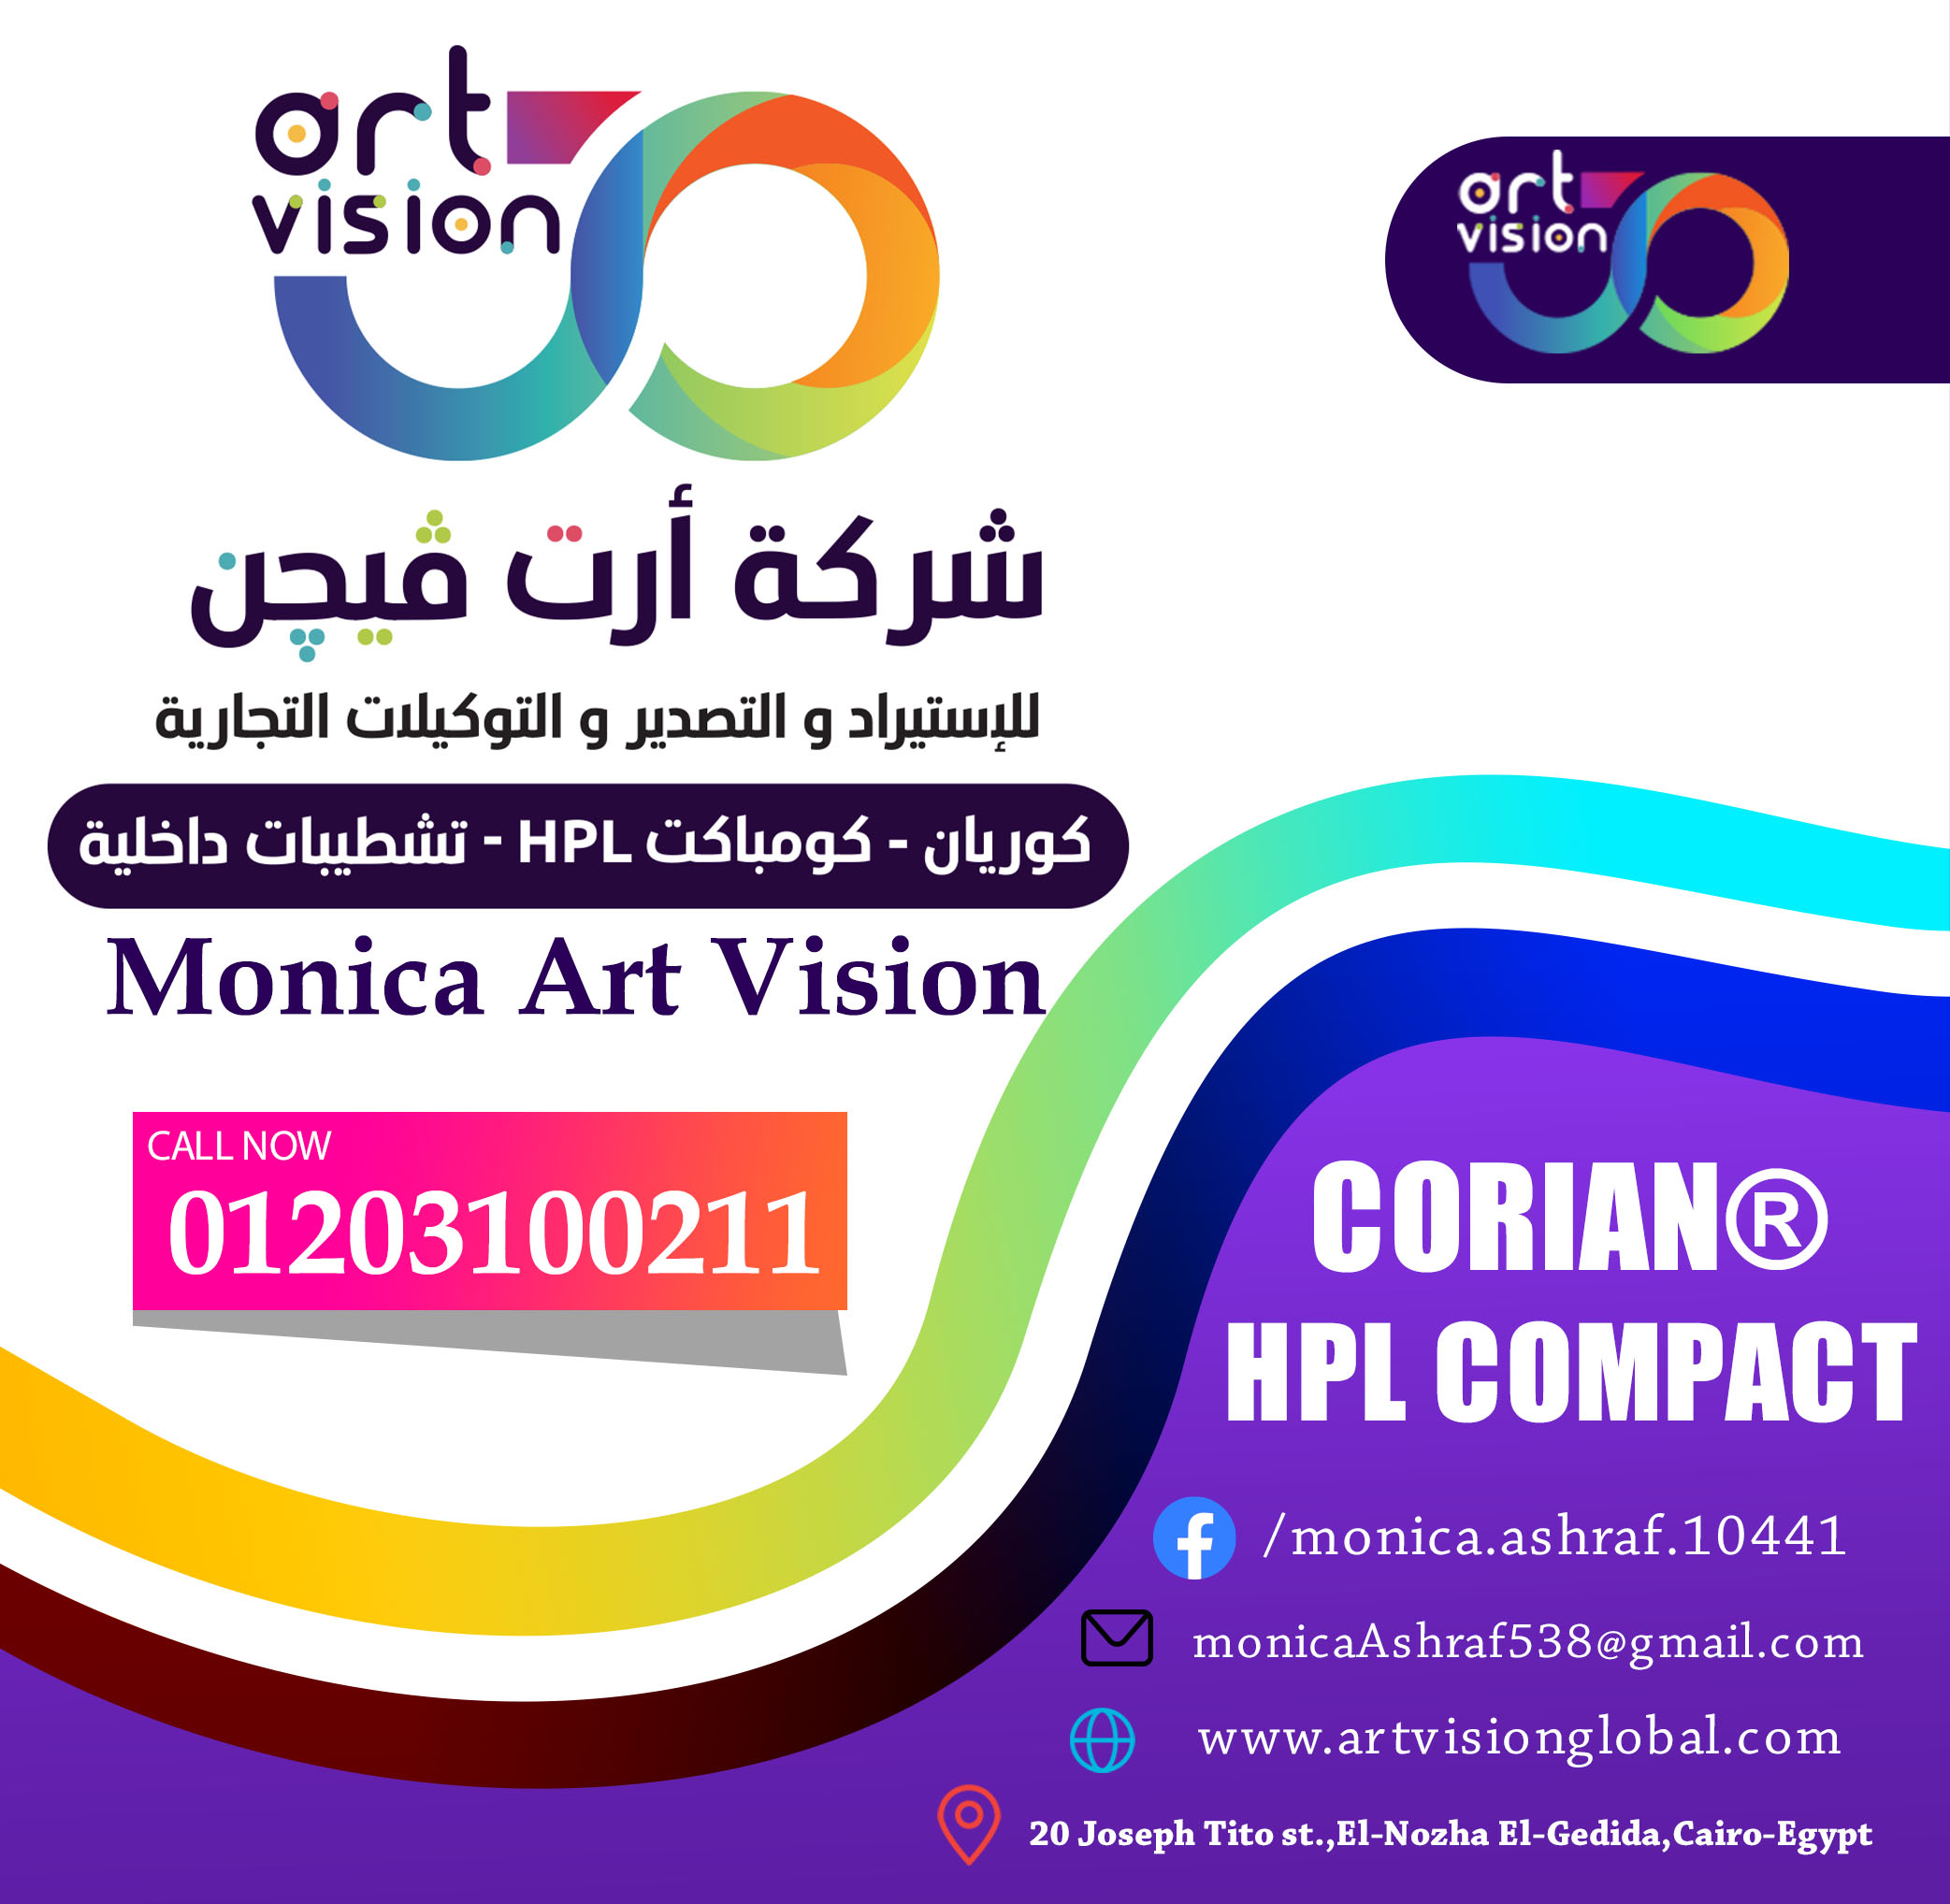 Monica art vision